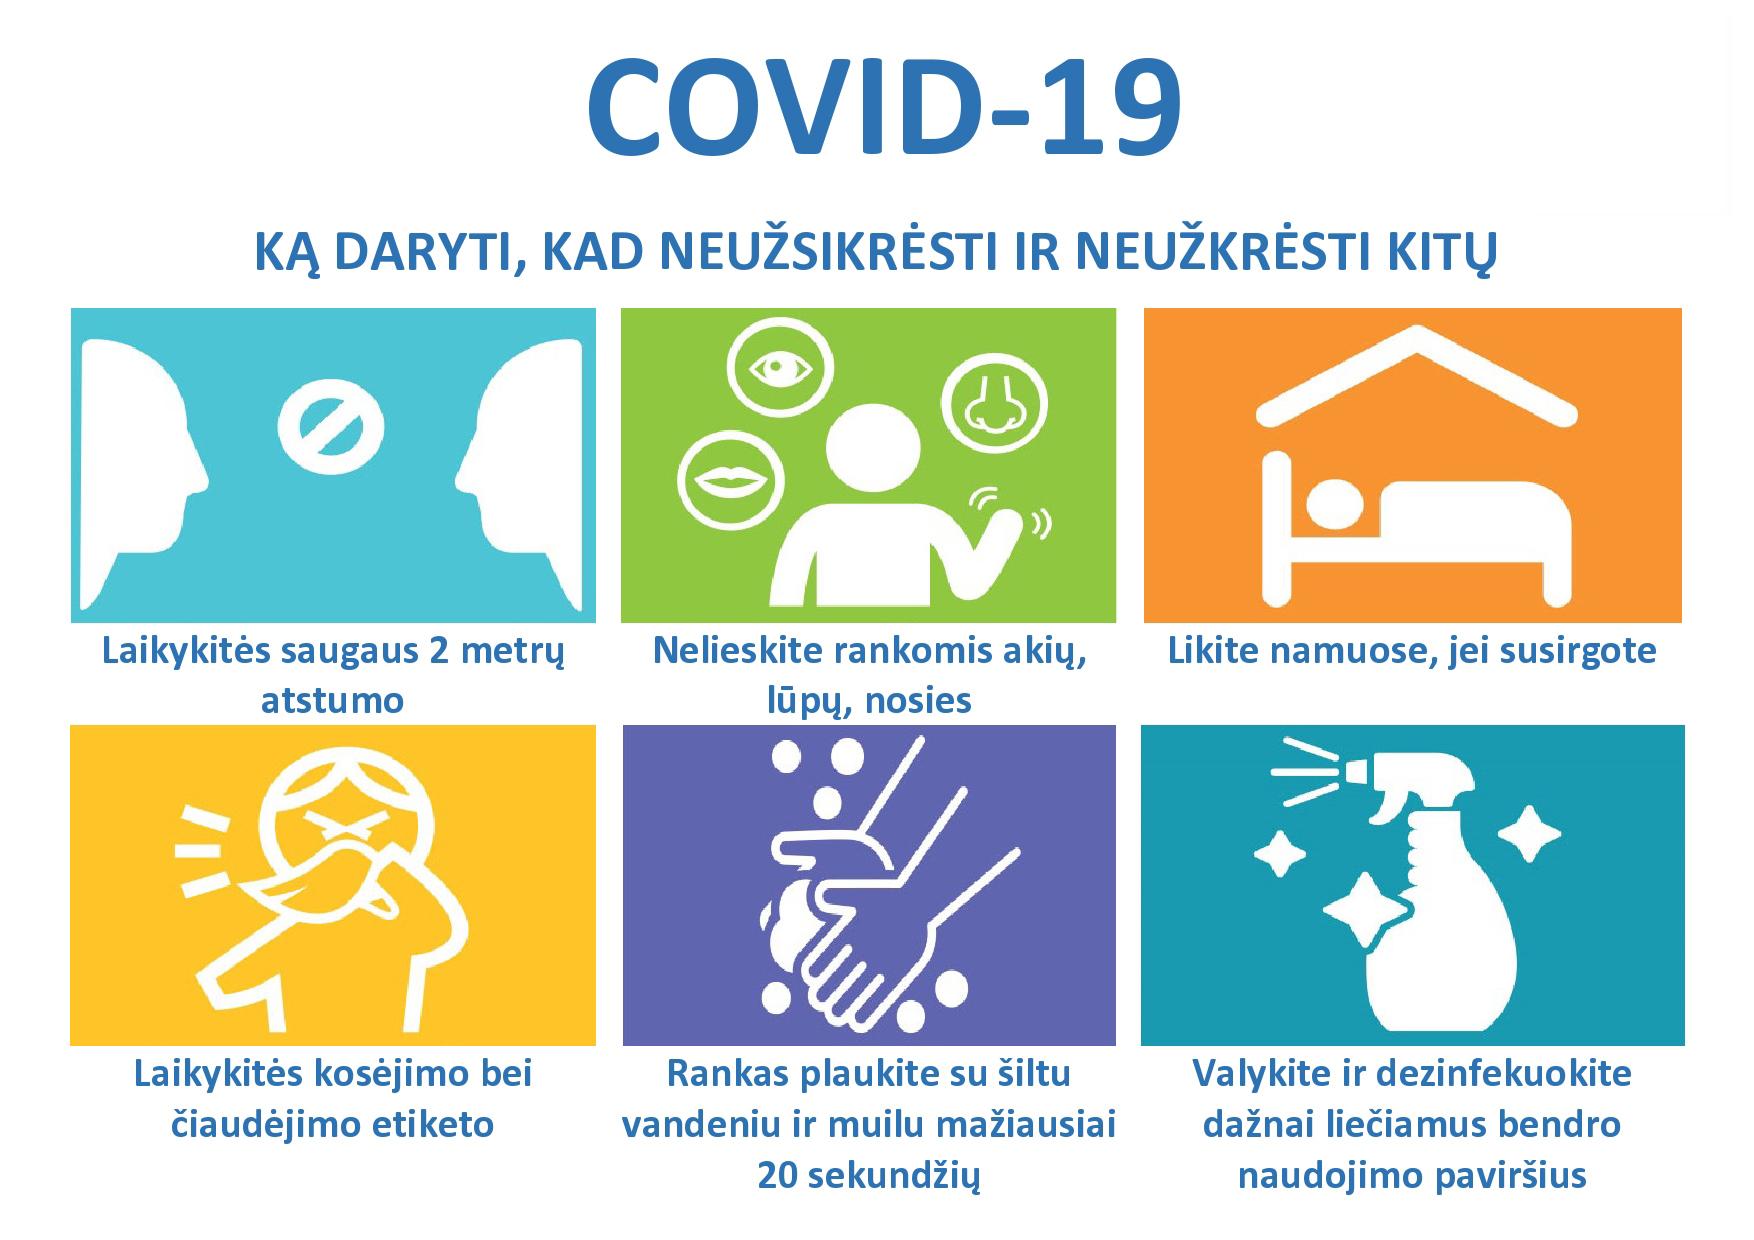 Kaip neužsikrėsti COVID-19?